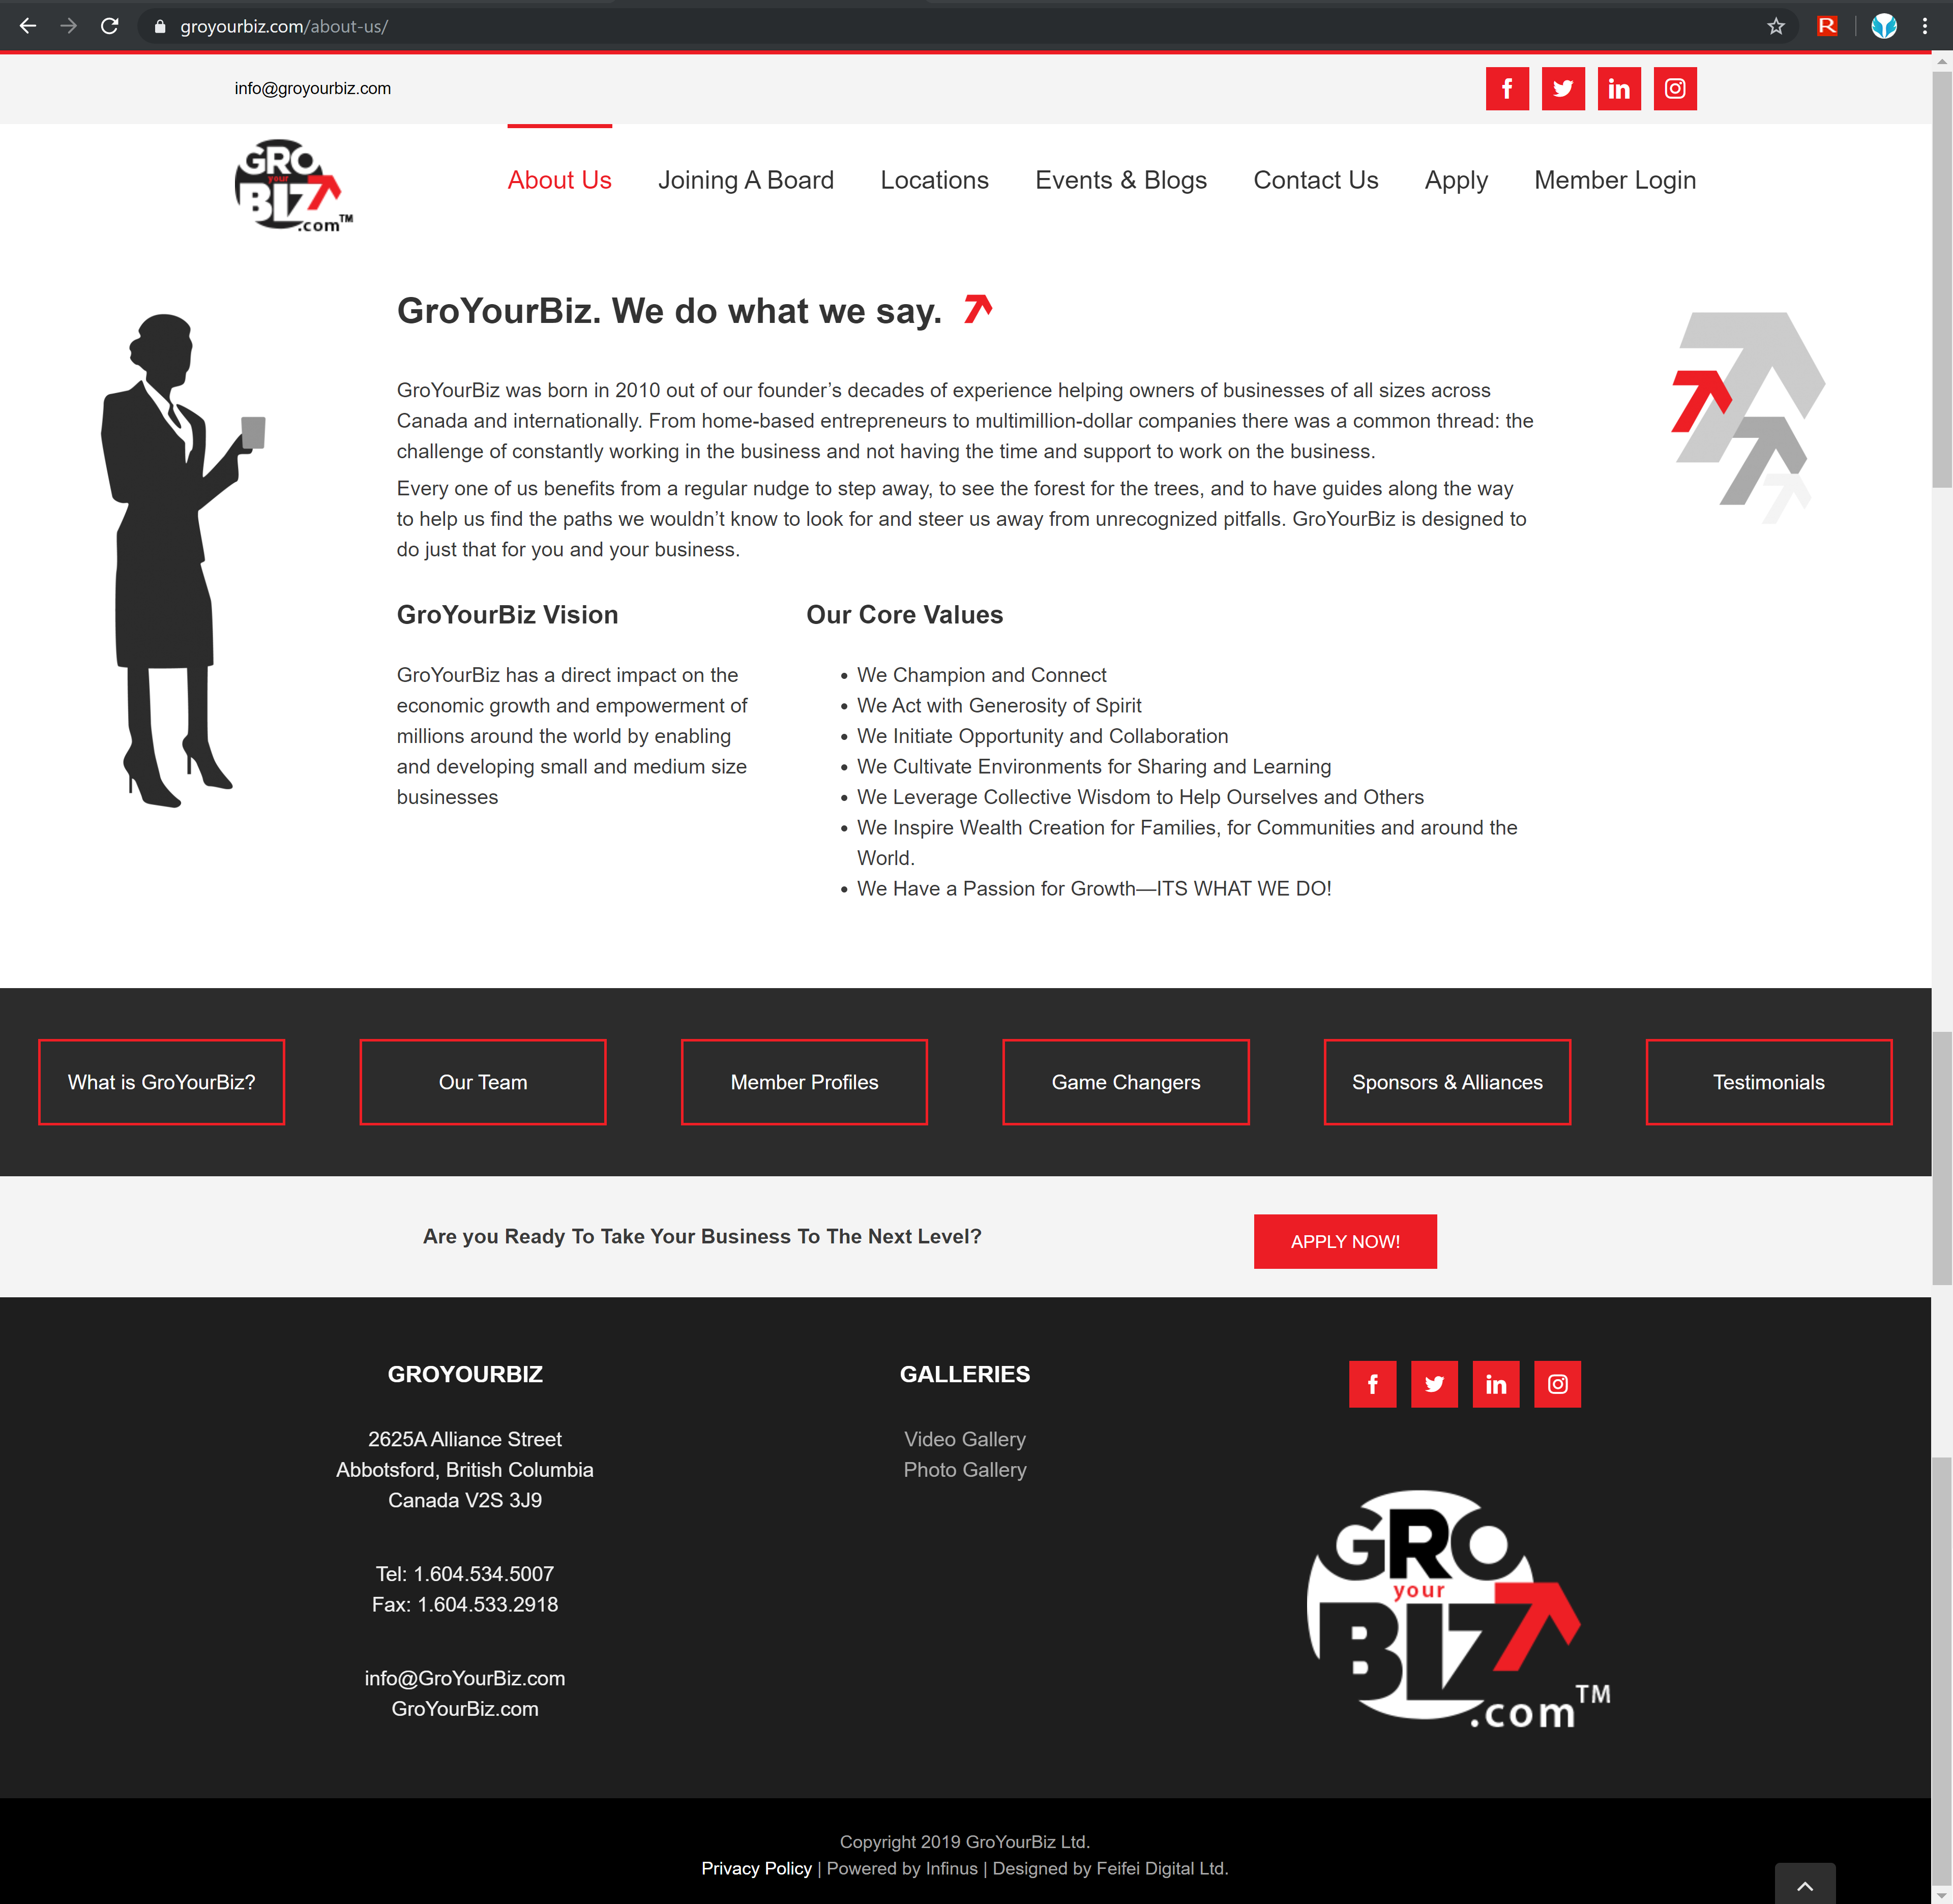 GroYourBiz About Us Page | User Interface and Front End Development | Feifei Digital | Monika Szucs